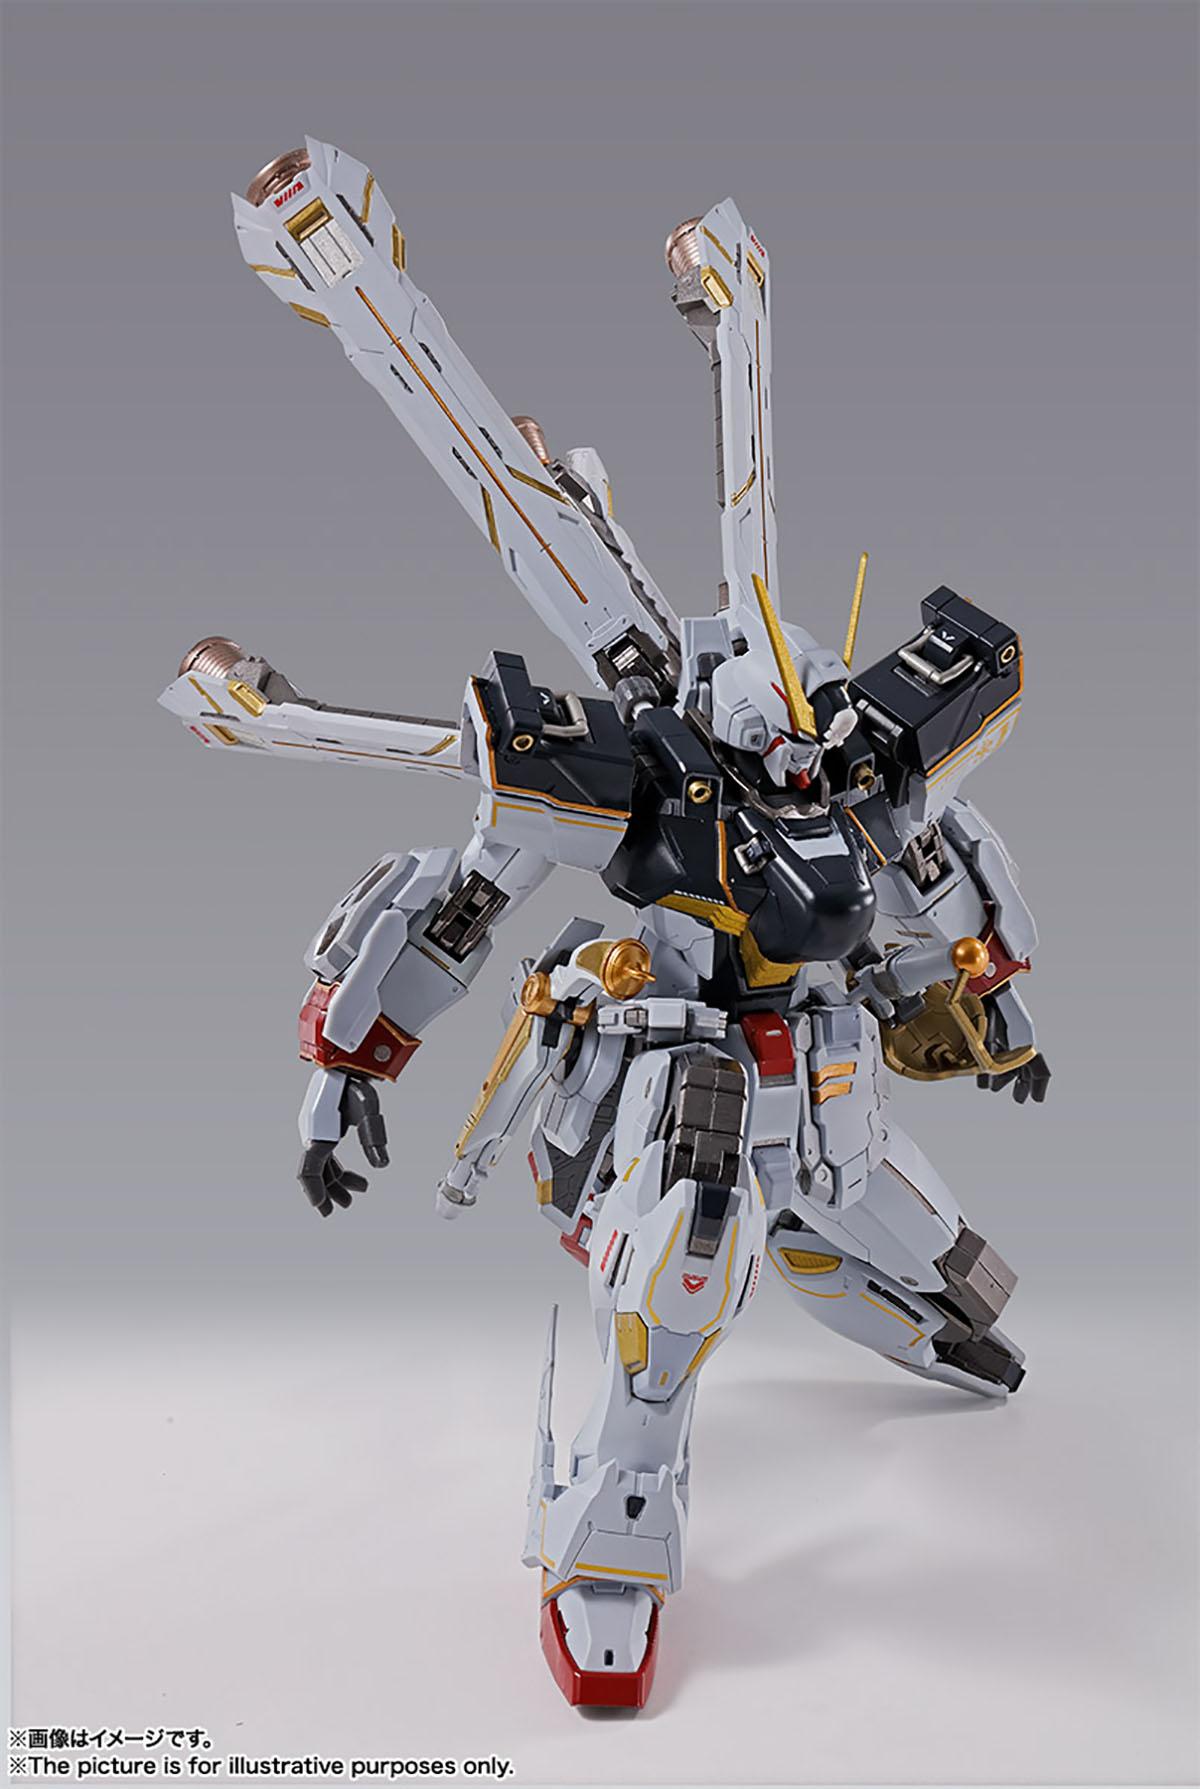 METAL BUILD『クロスボーン・ガンダムX1』機動戦士クロスボーン・ガンダム 可動フィギュア-009